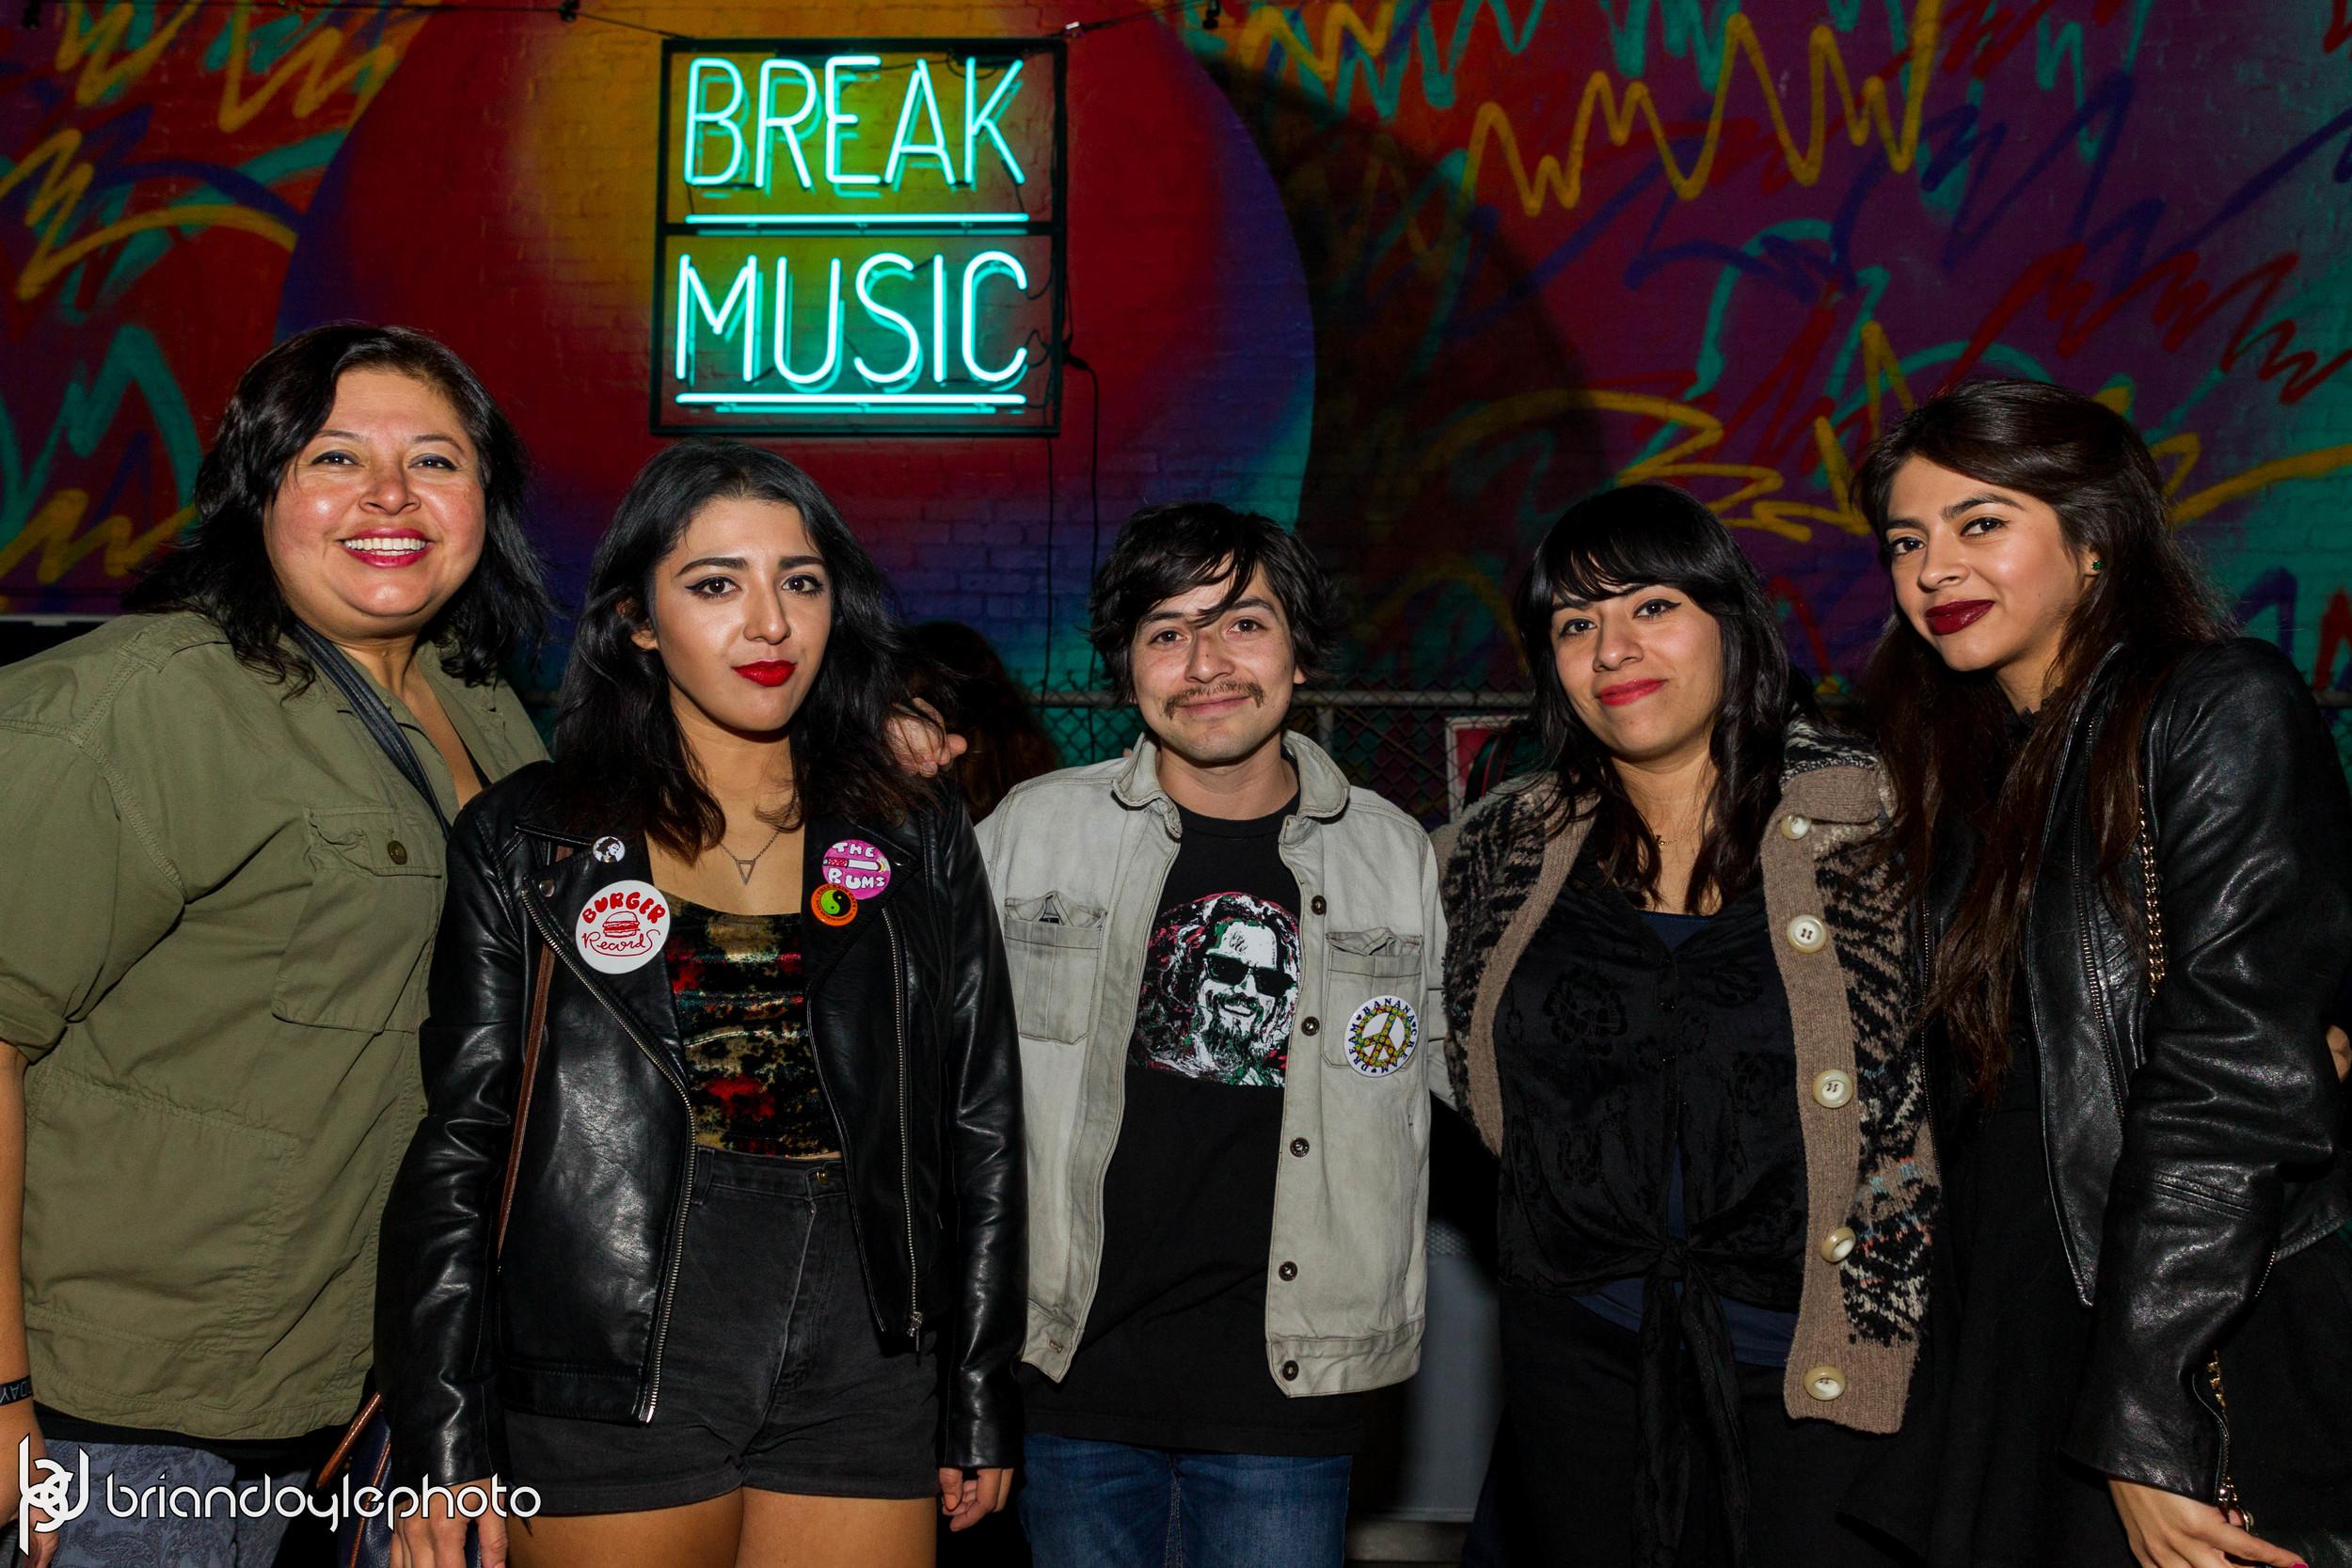 Red Bull - Dum Dum Girls, Tropicana and the Flea, Lowell @ The Well 2014.11.16-19.jpg